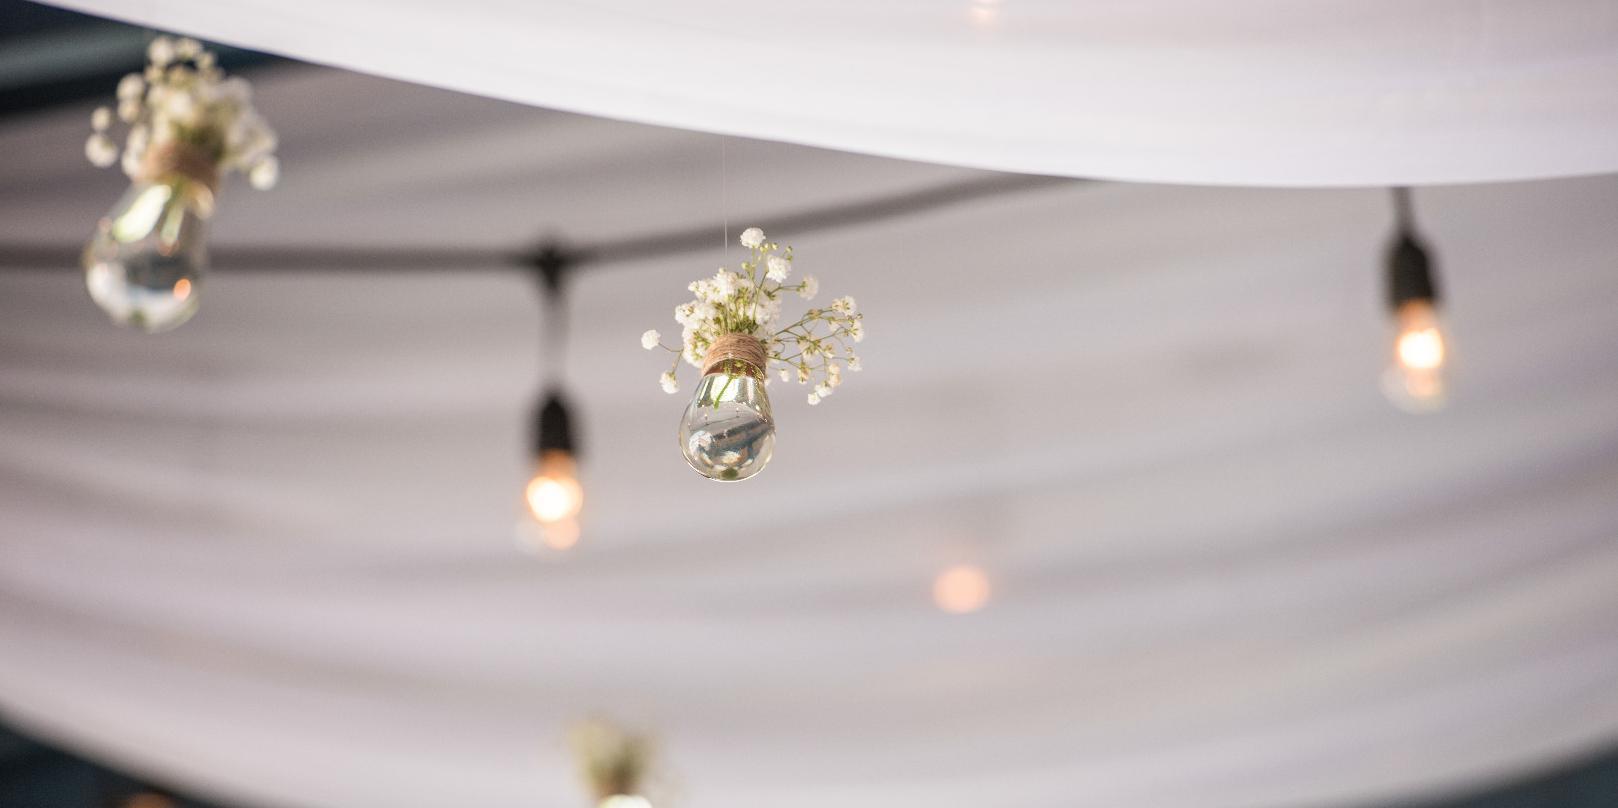 bodas-sin-clasificar-sin-tema-cuba-34581.jpg